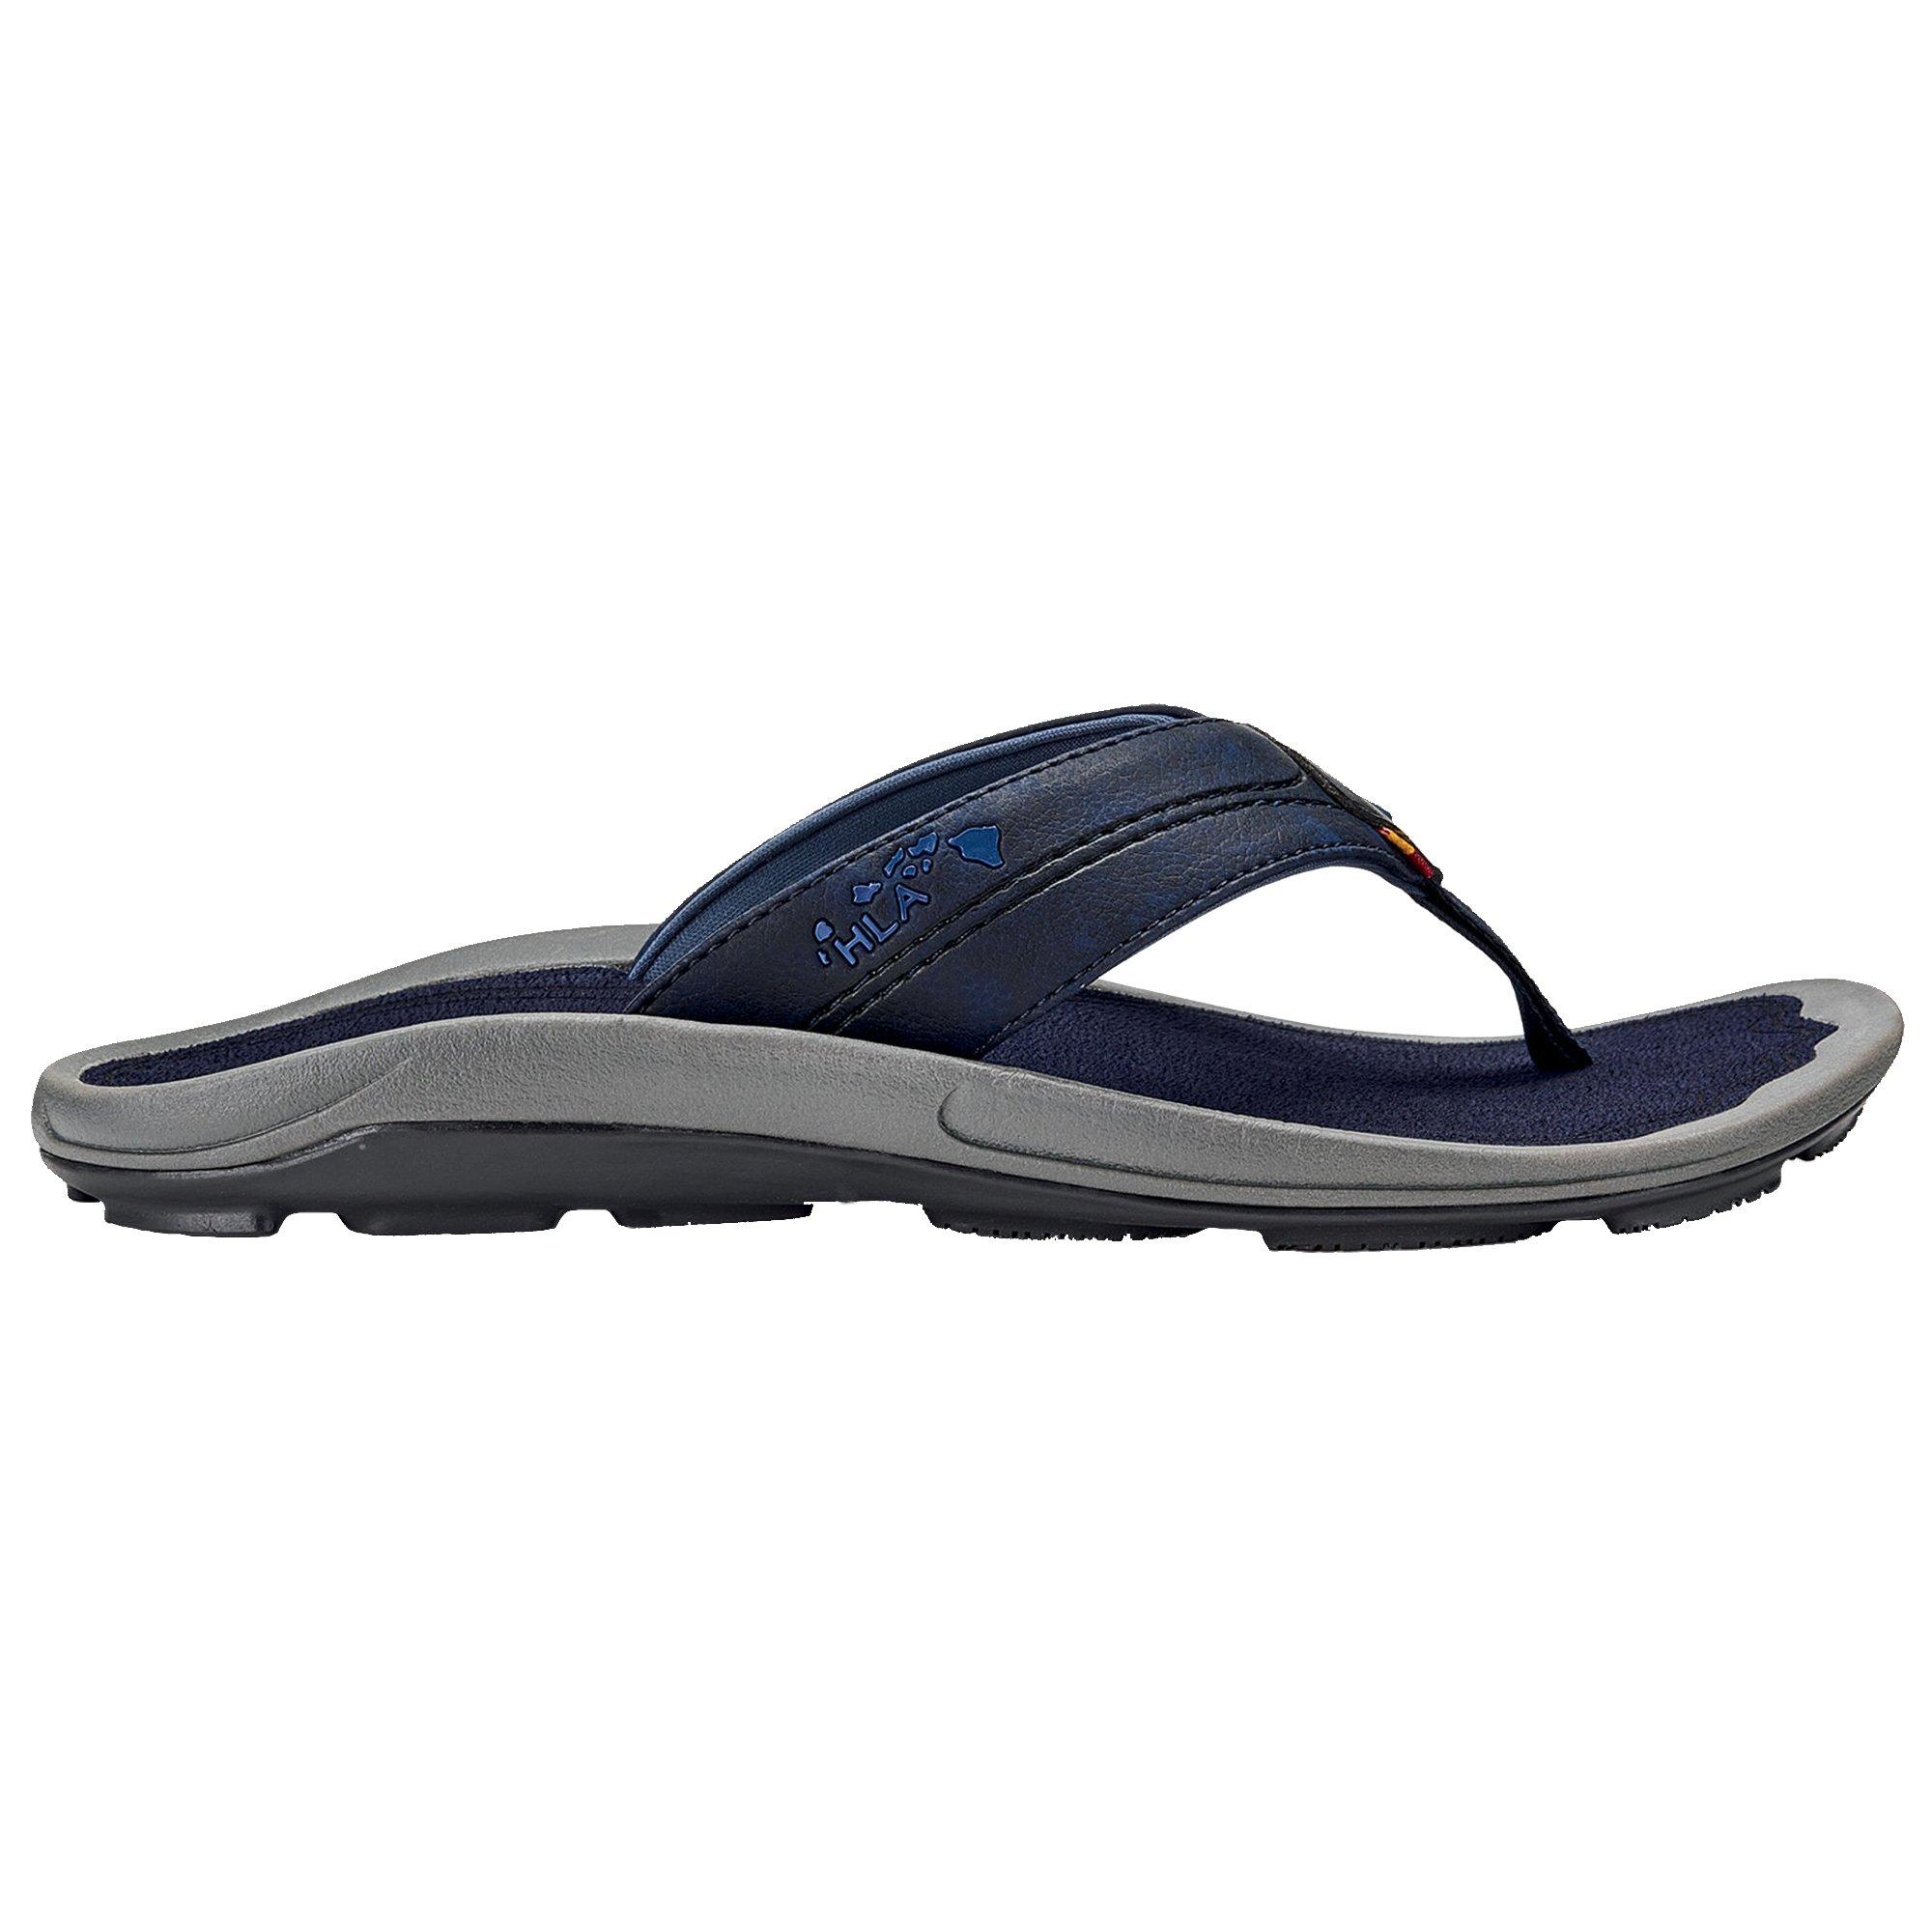 OLUKAI New Oluaki Men's Kipi Flip Flop Trench Blue/Trench Blue 12